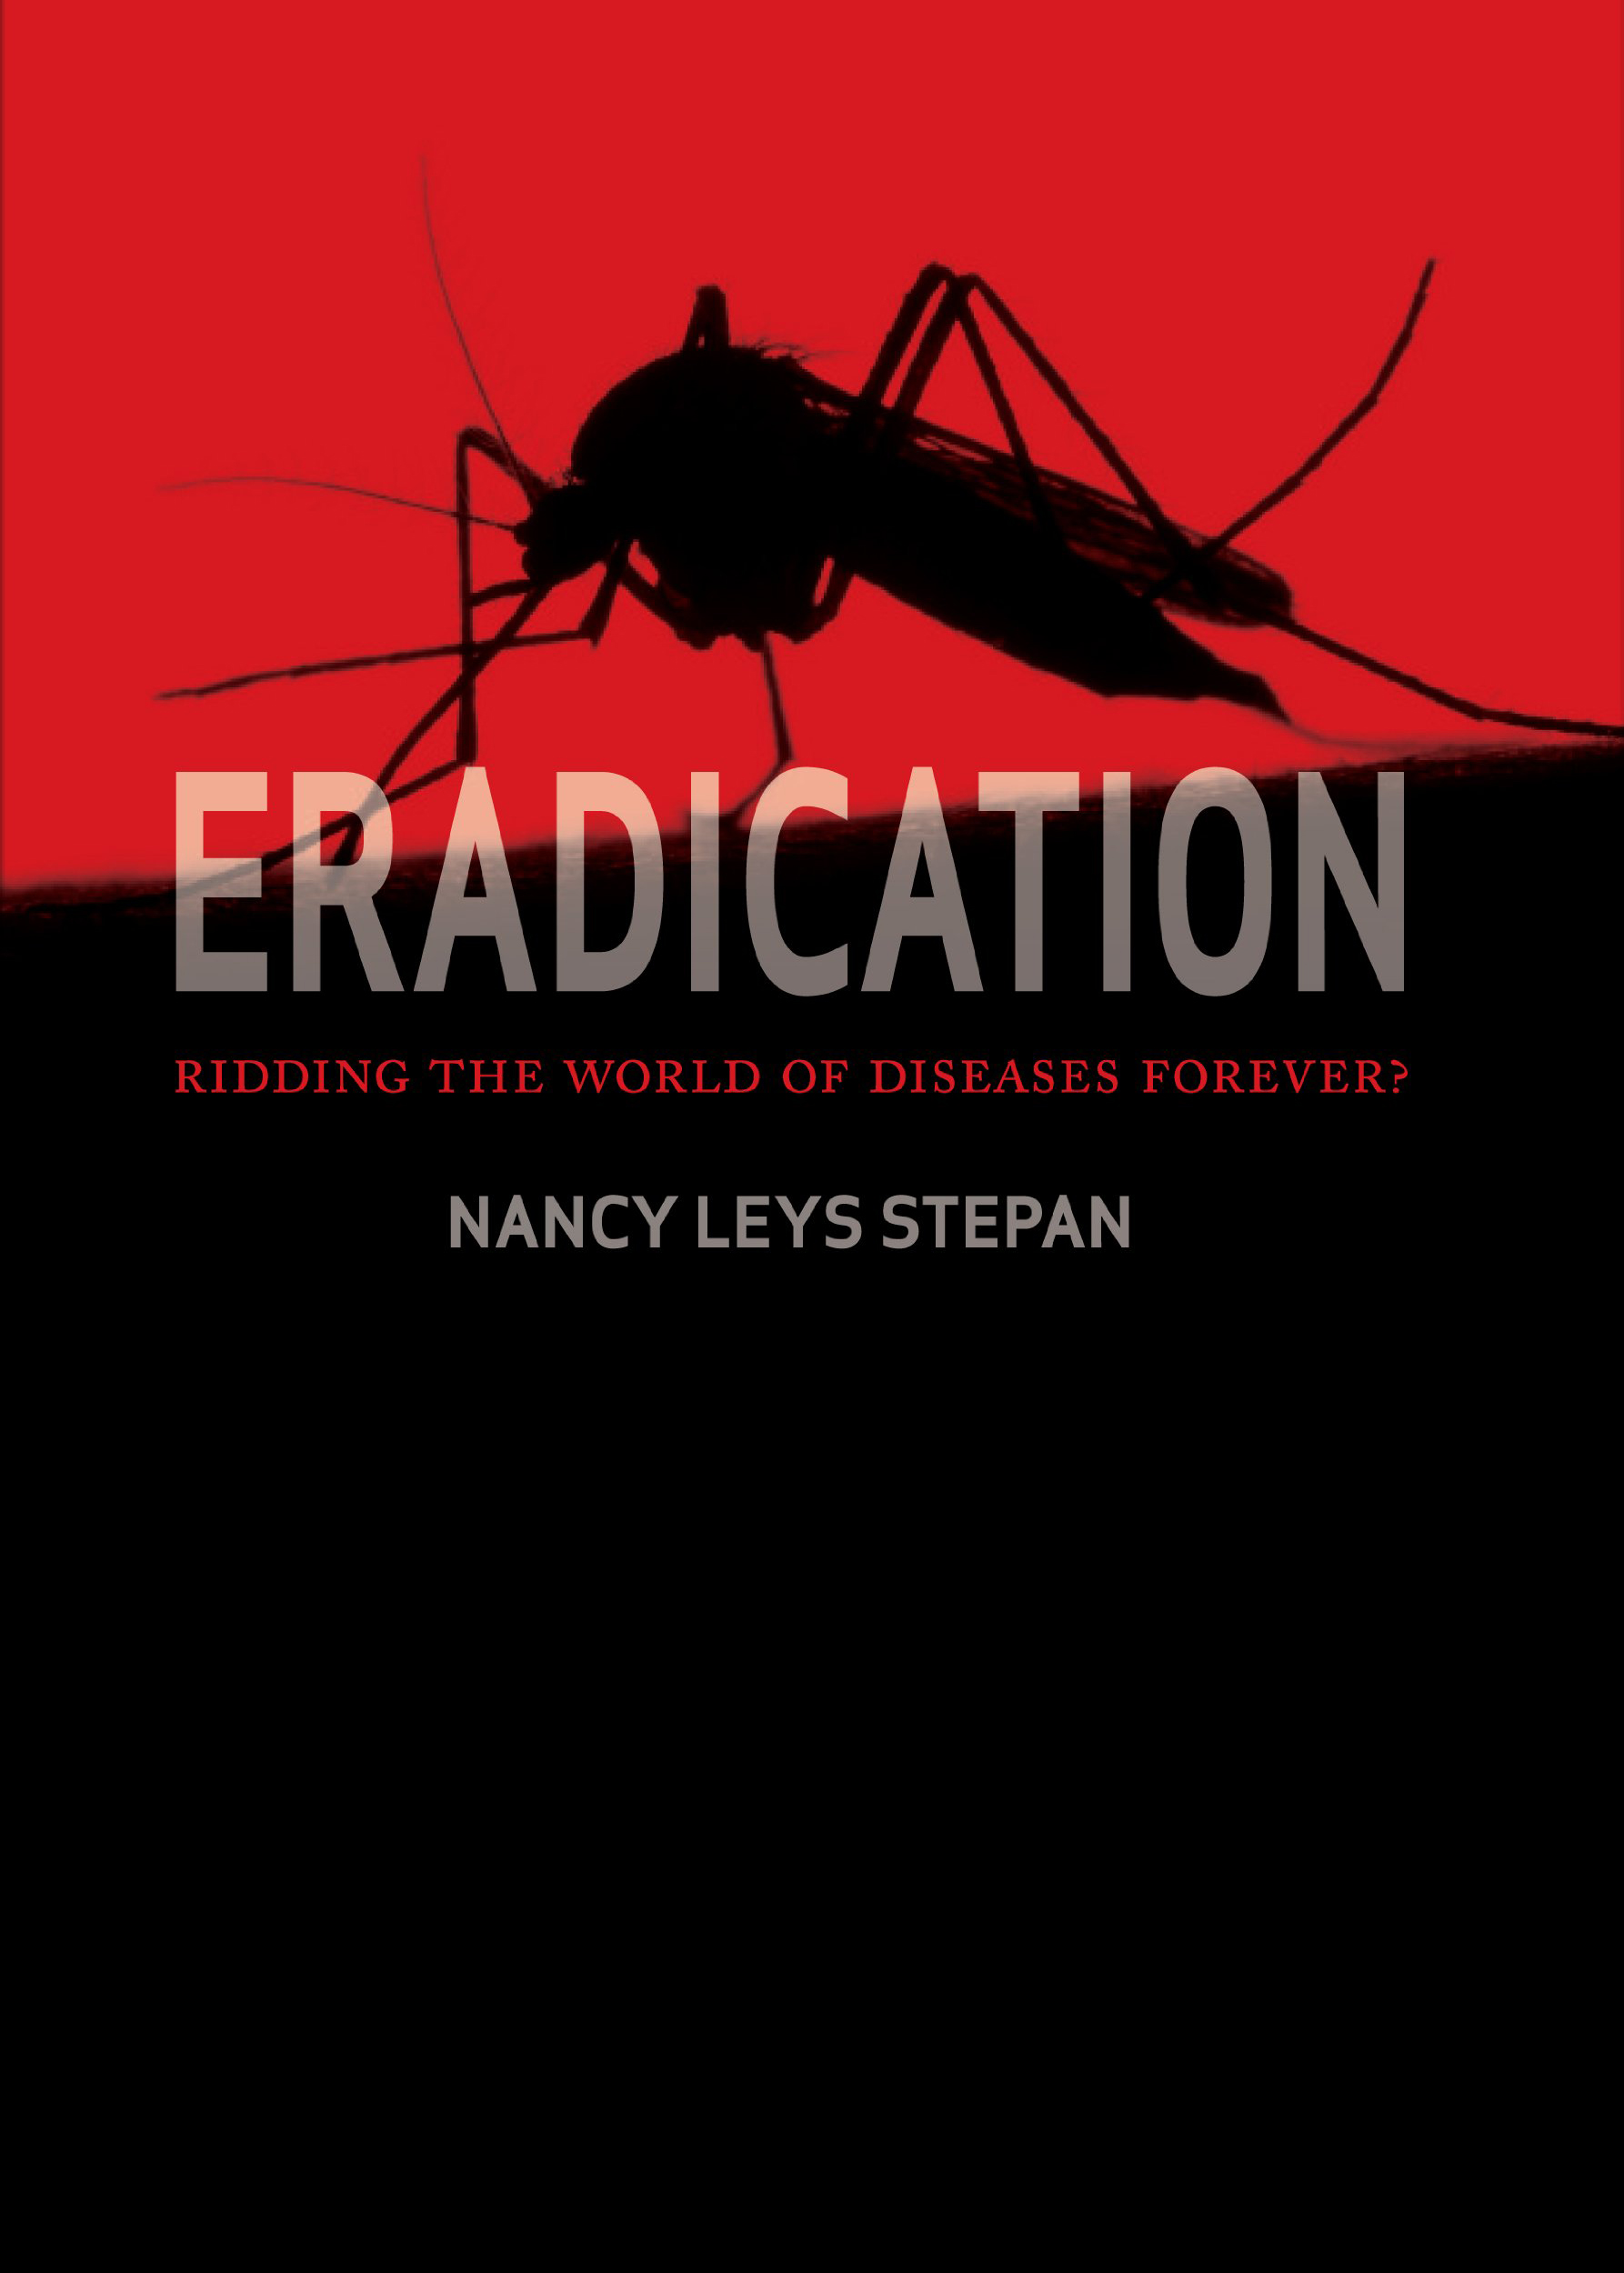 Stepan, Nancy - Eradication.jpg